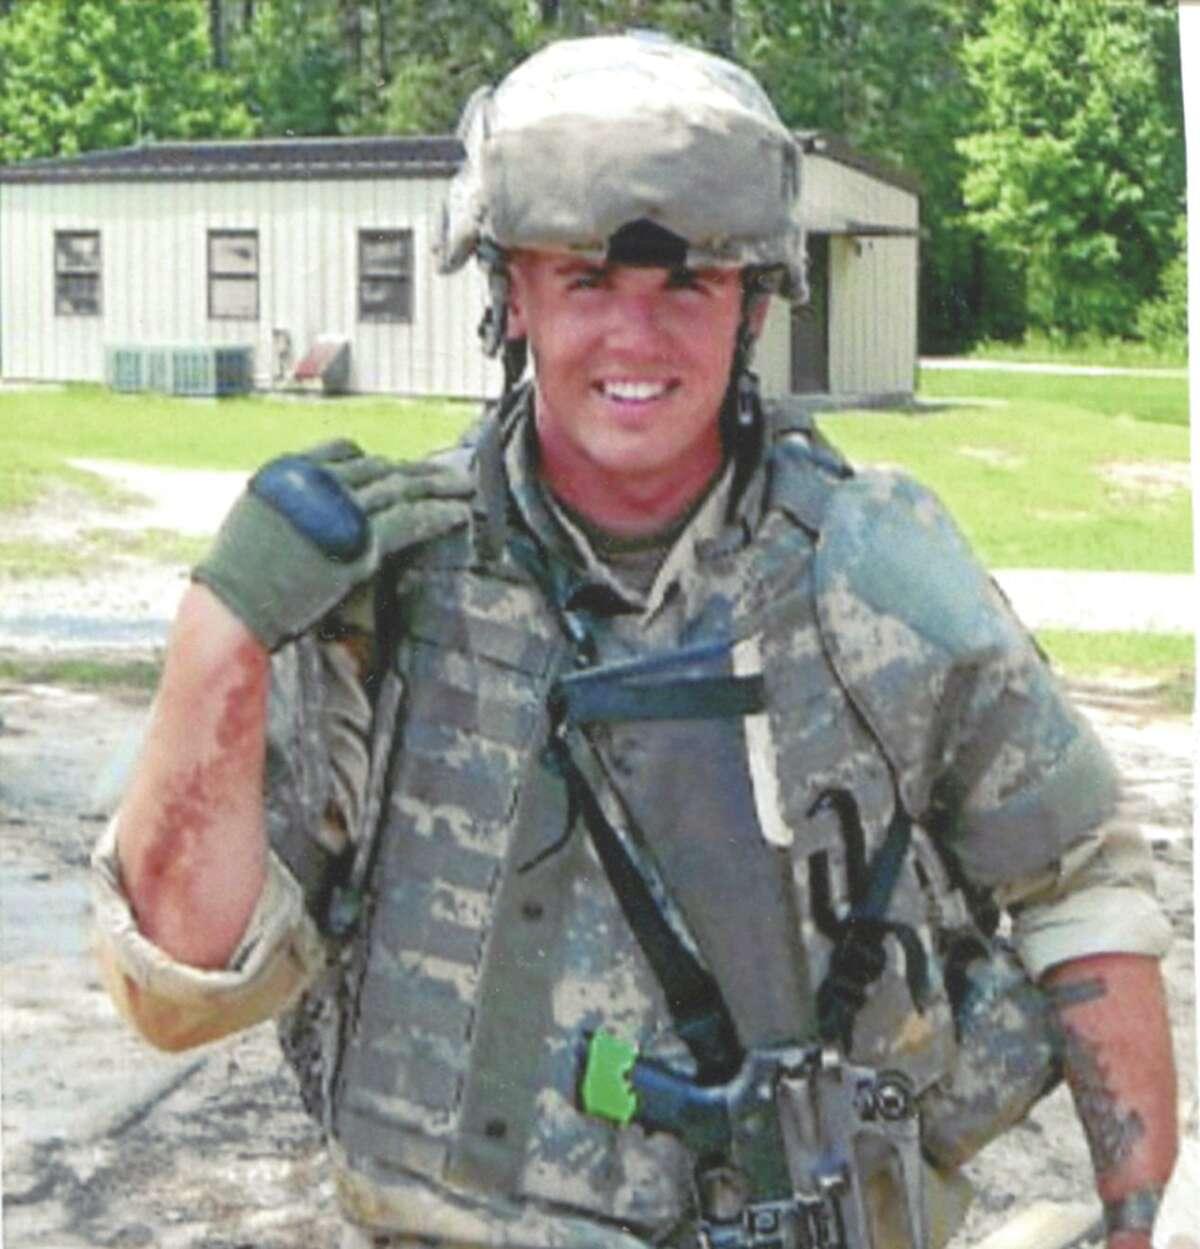 Jesse Chandler, U.S. Navy